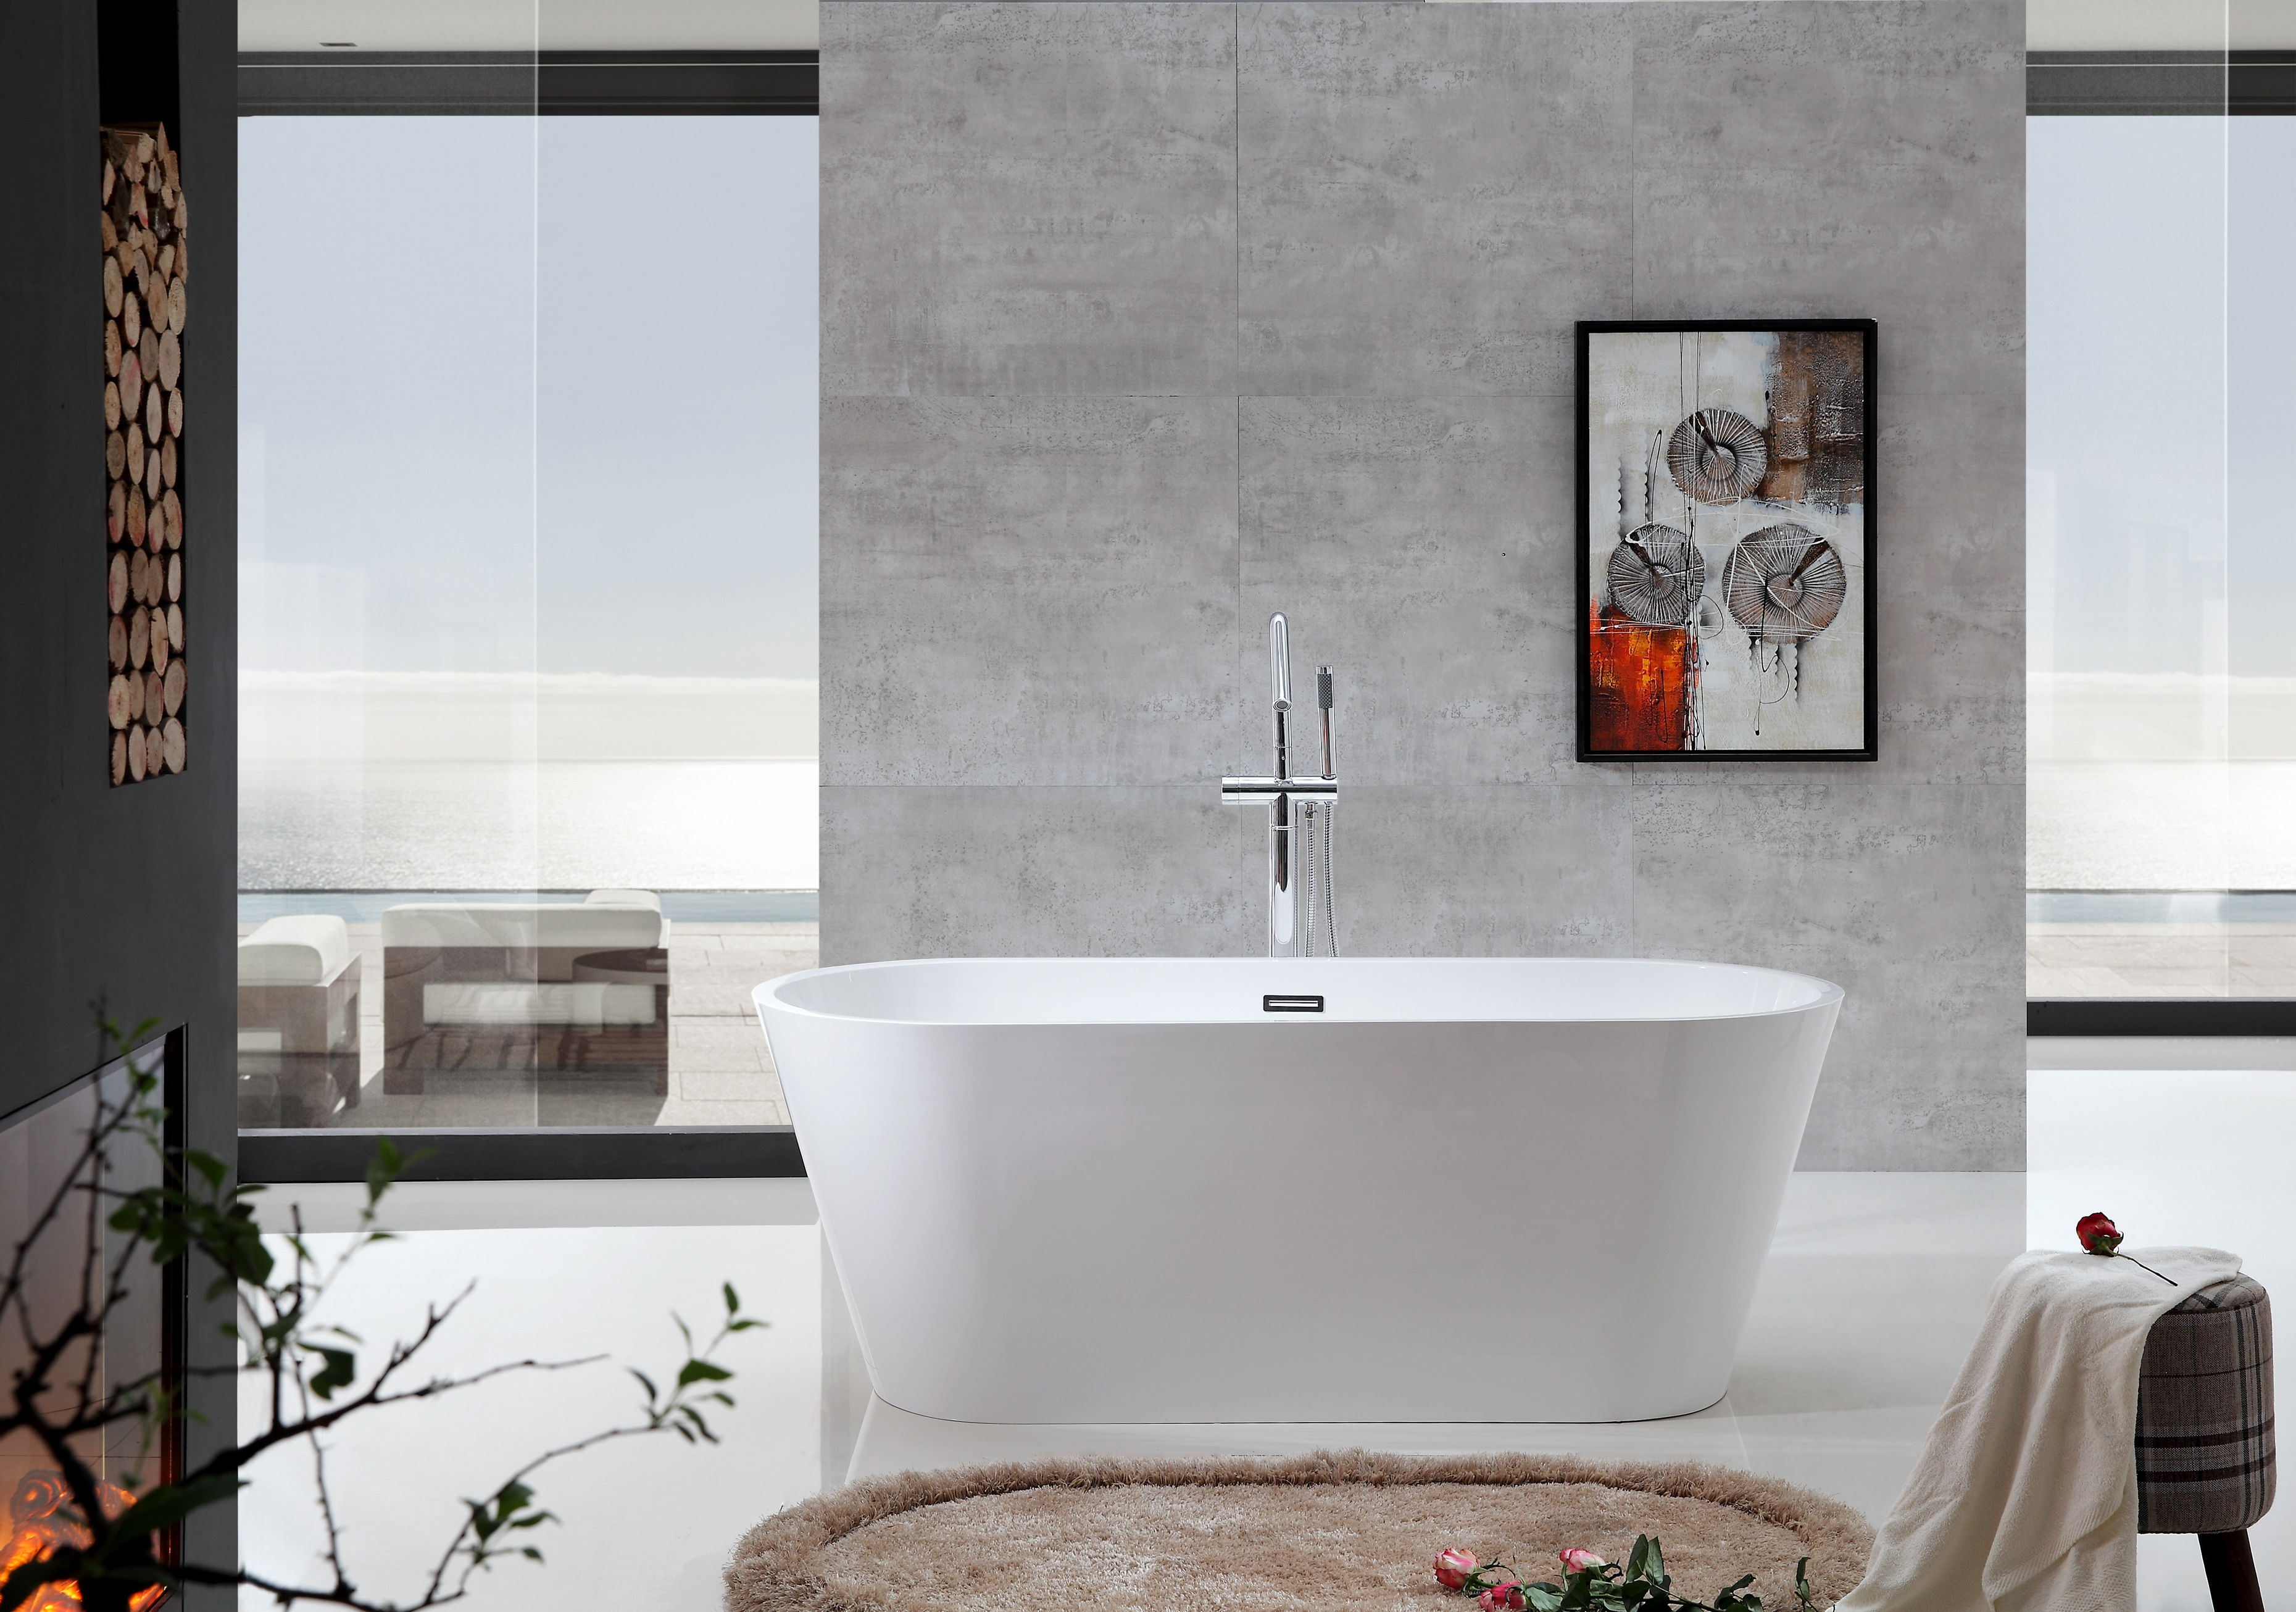 Tranquillity stone free standing bath tub - Rio Bathroom Warehouse